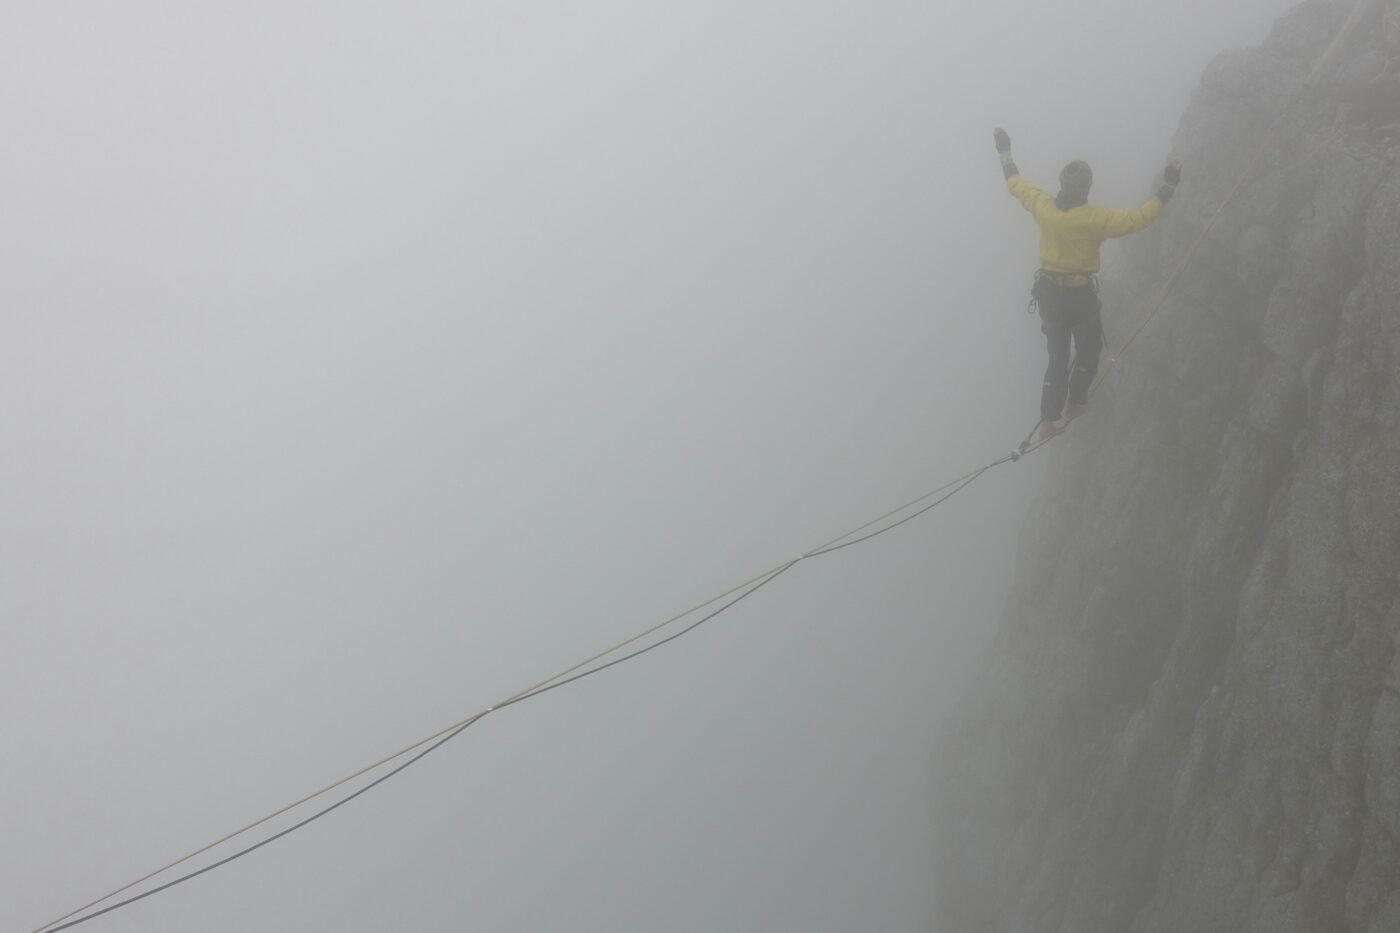 Balansa Slackline - Triglav Highline, slackline nad triglavsko severno steno